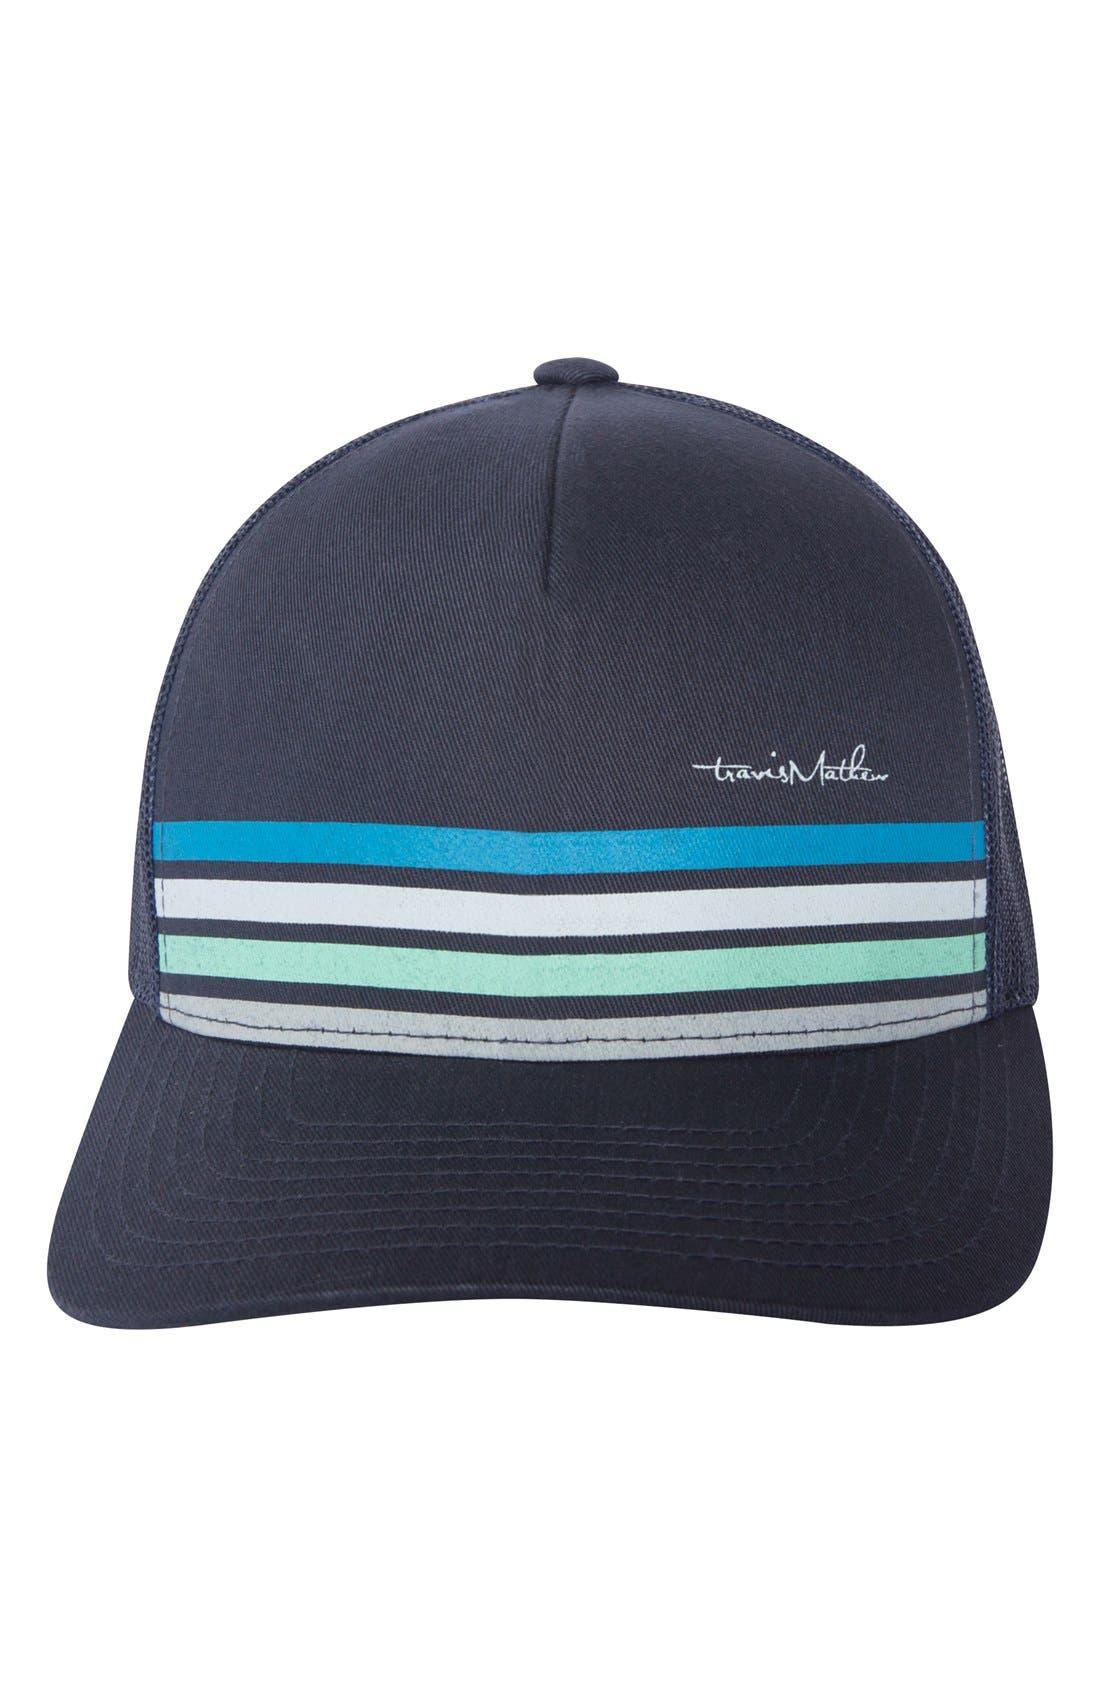 Main Image - Travis Mathew 'Hoover' Hat